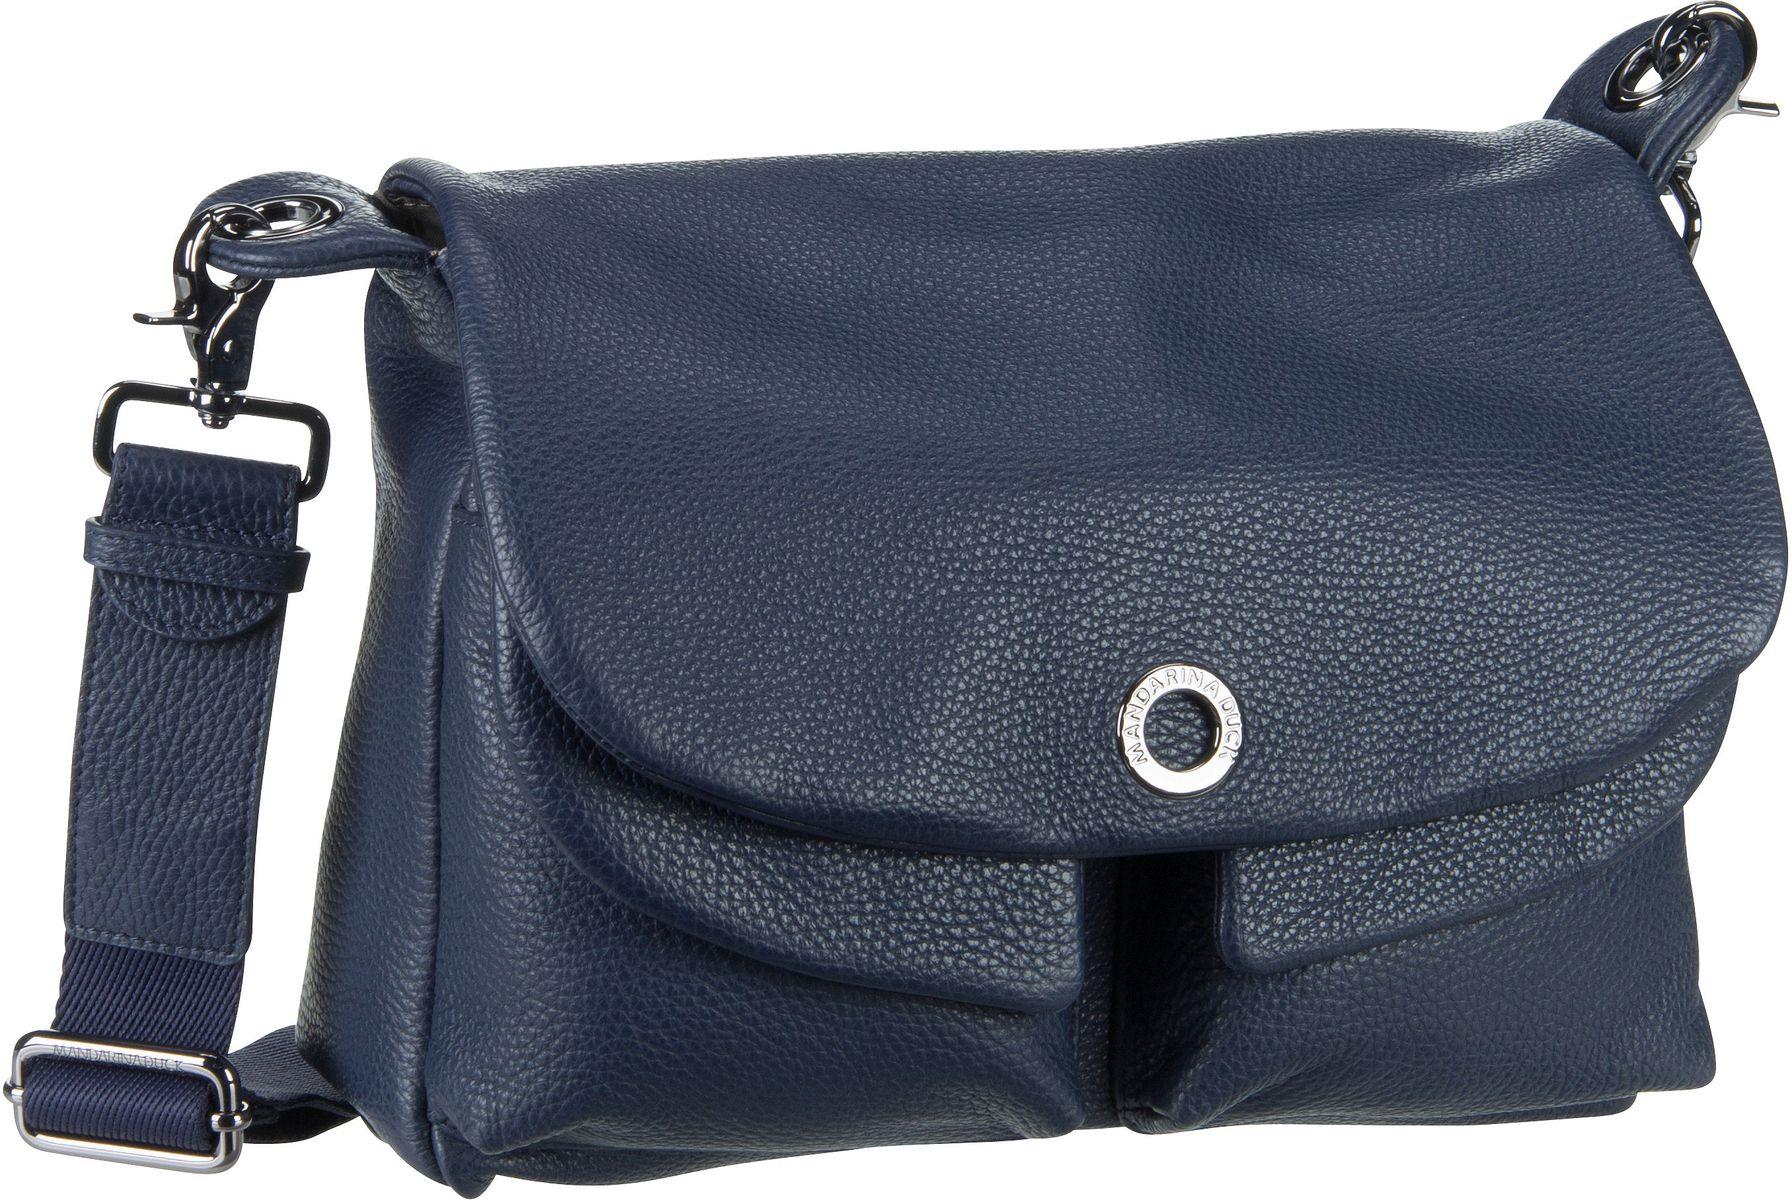 Umhängetasche Mellow Leather Shoulder Bag FZT23 Dress Blue